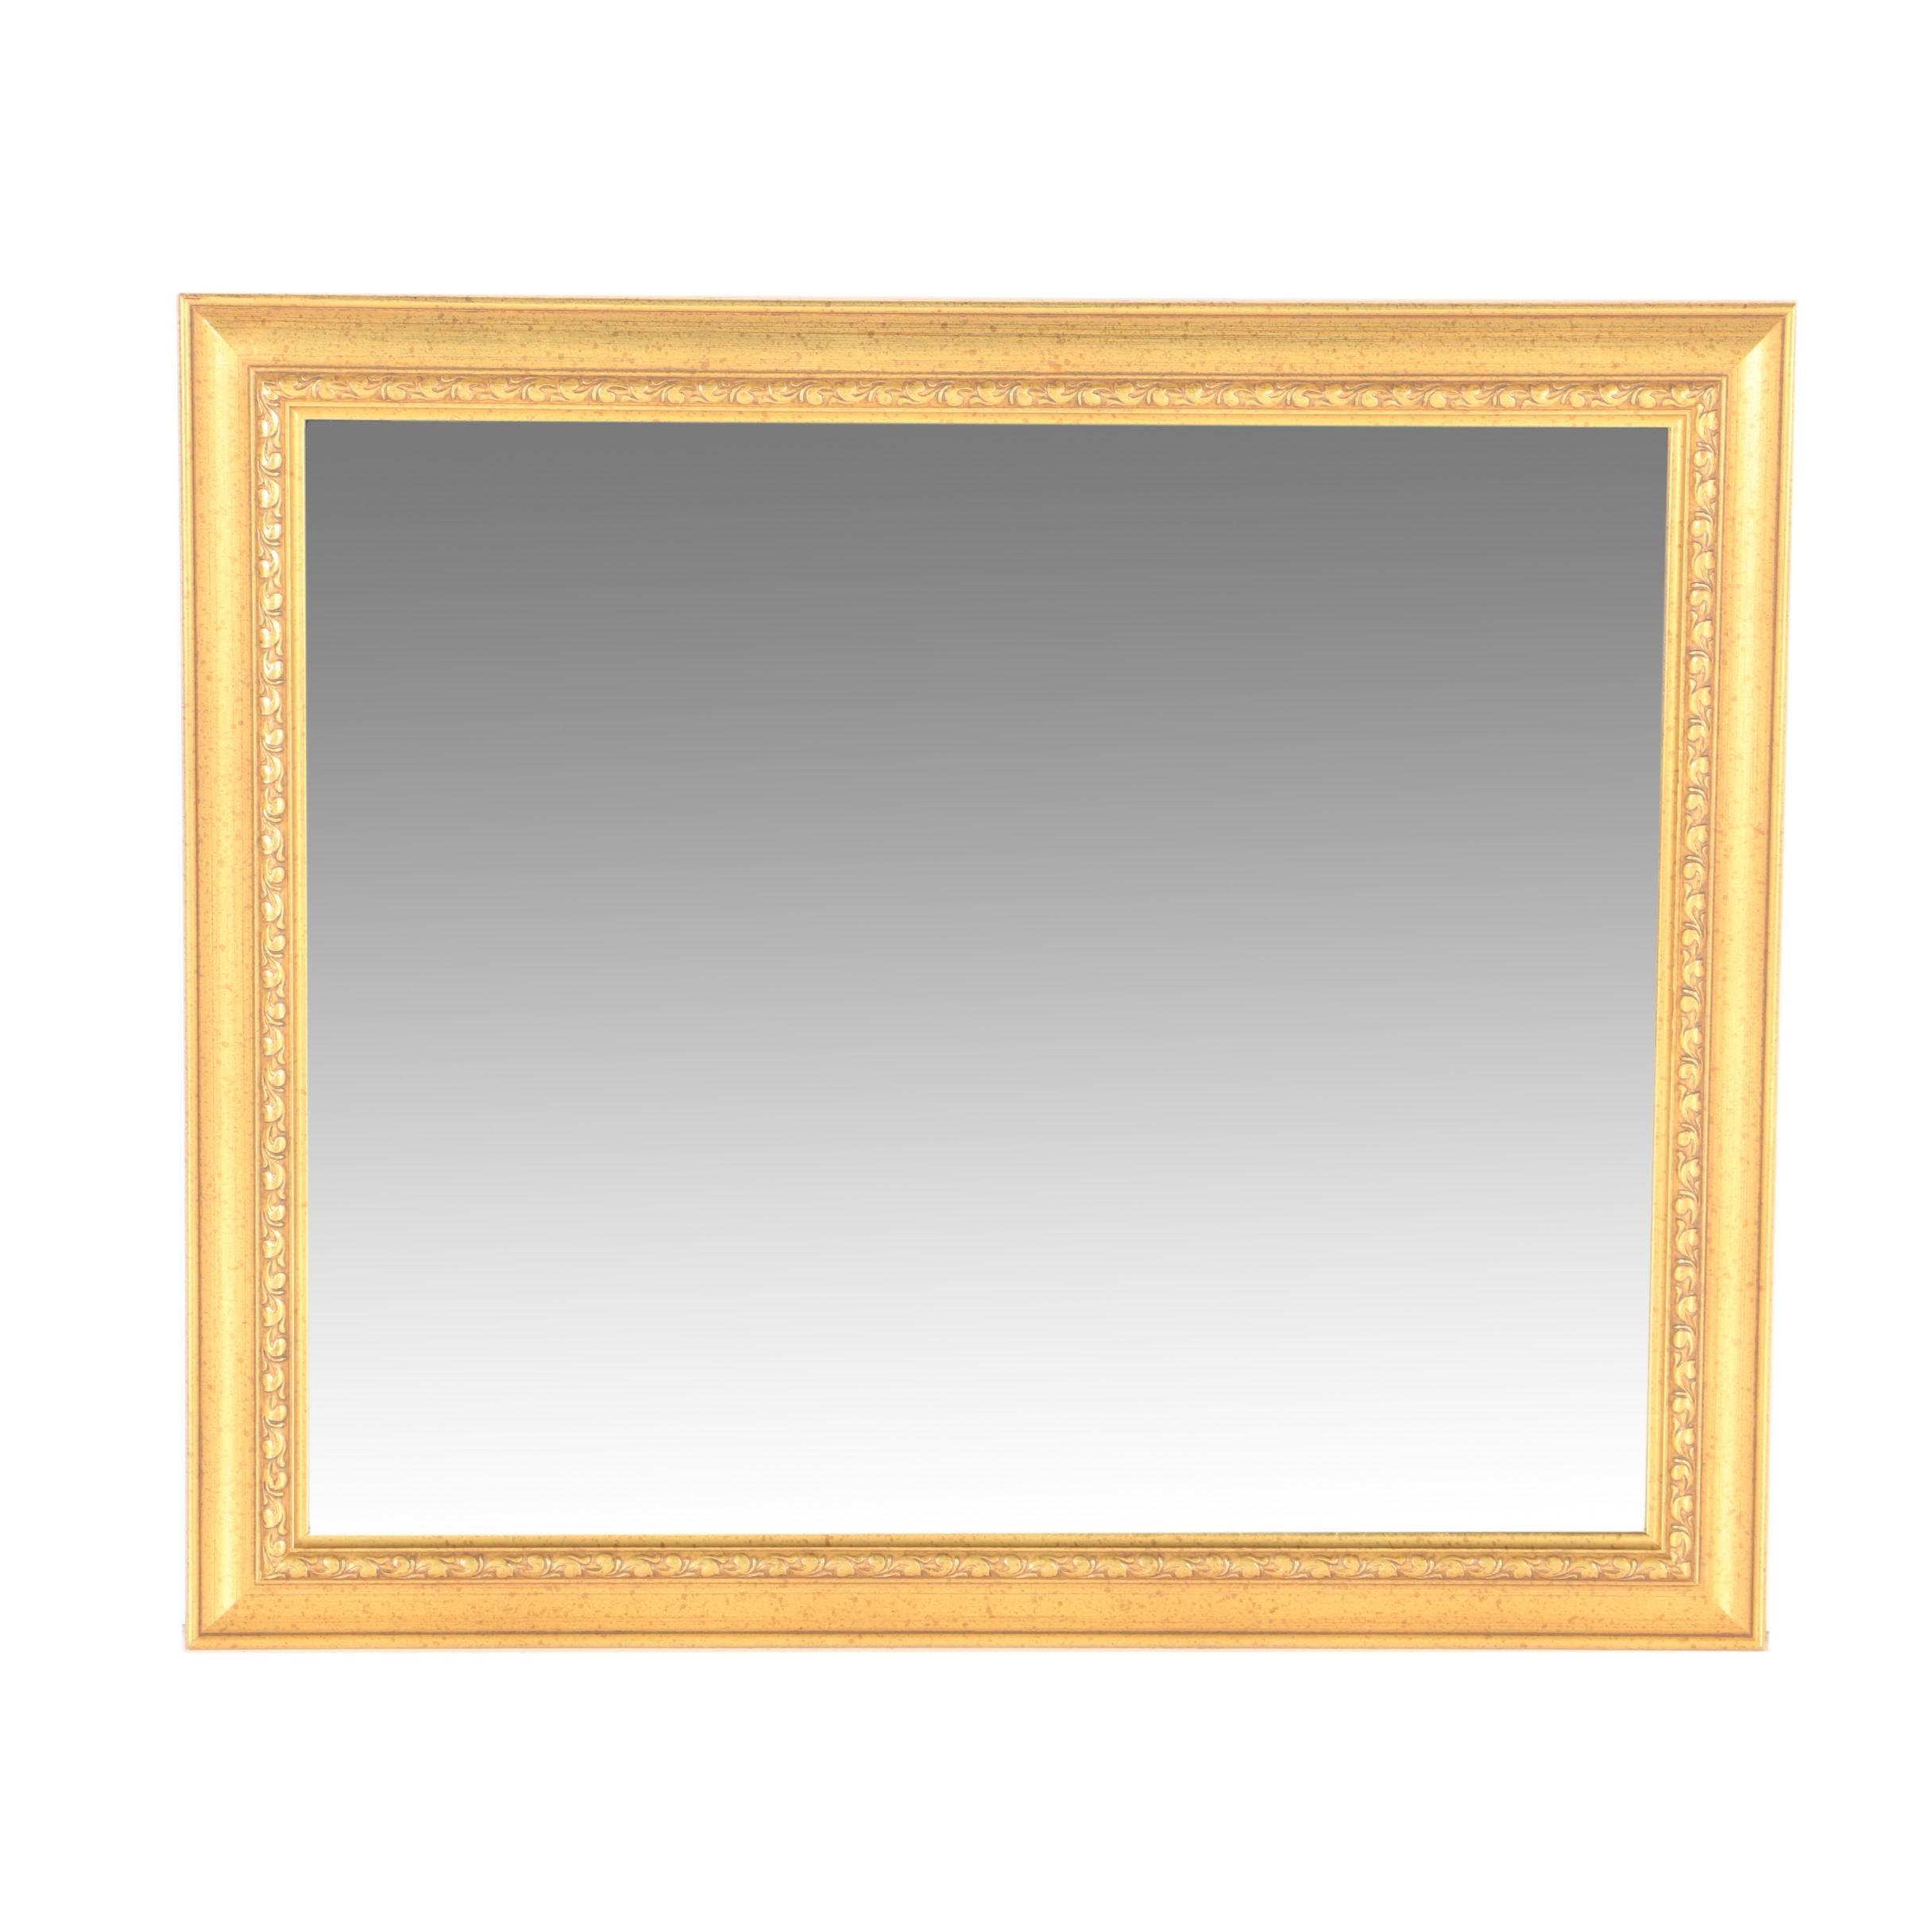 Gold Tone Wood Framed Wall Mirror